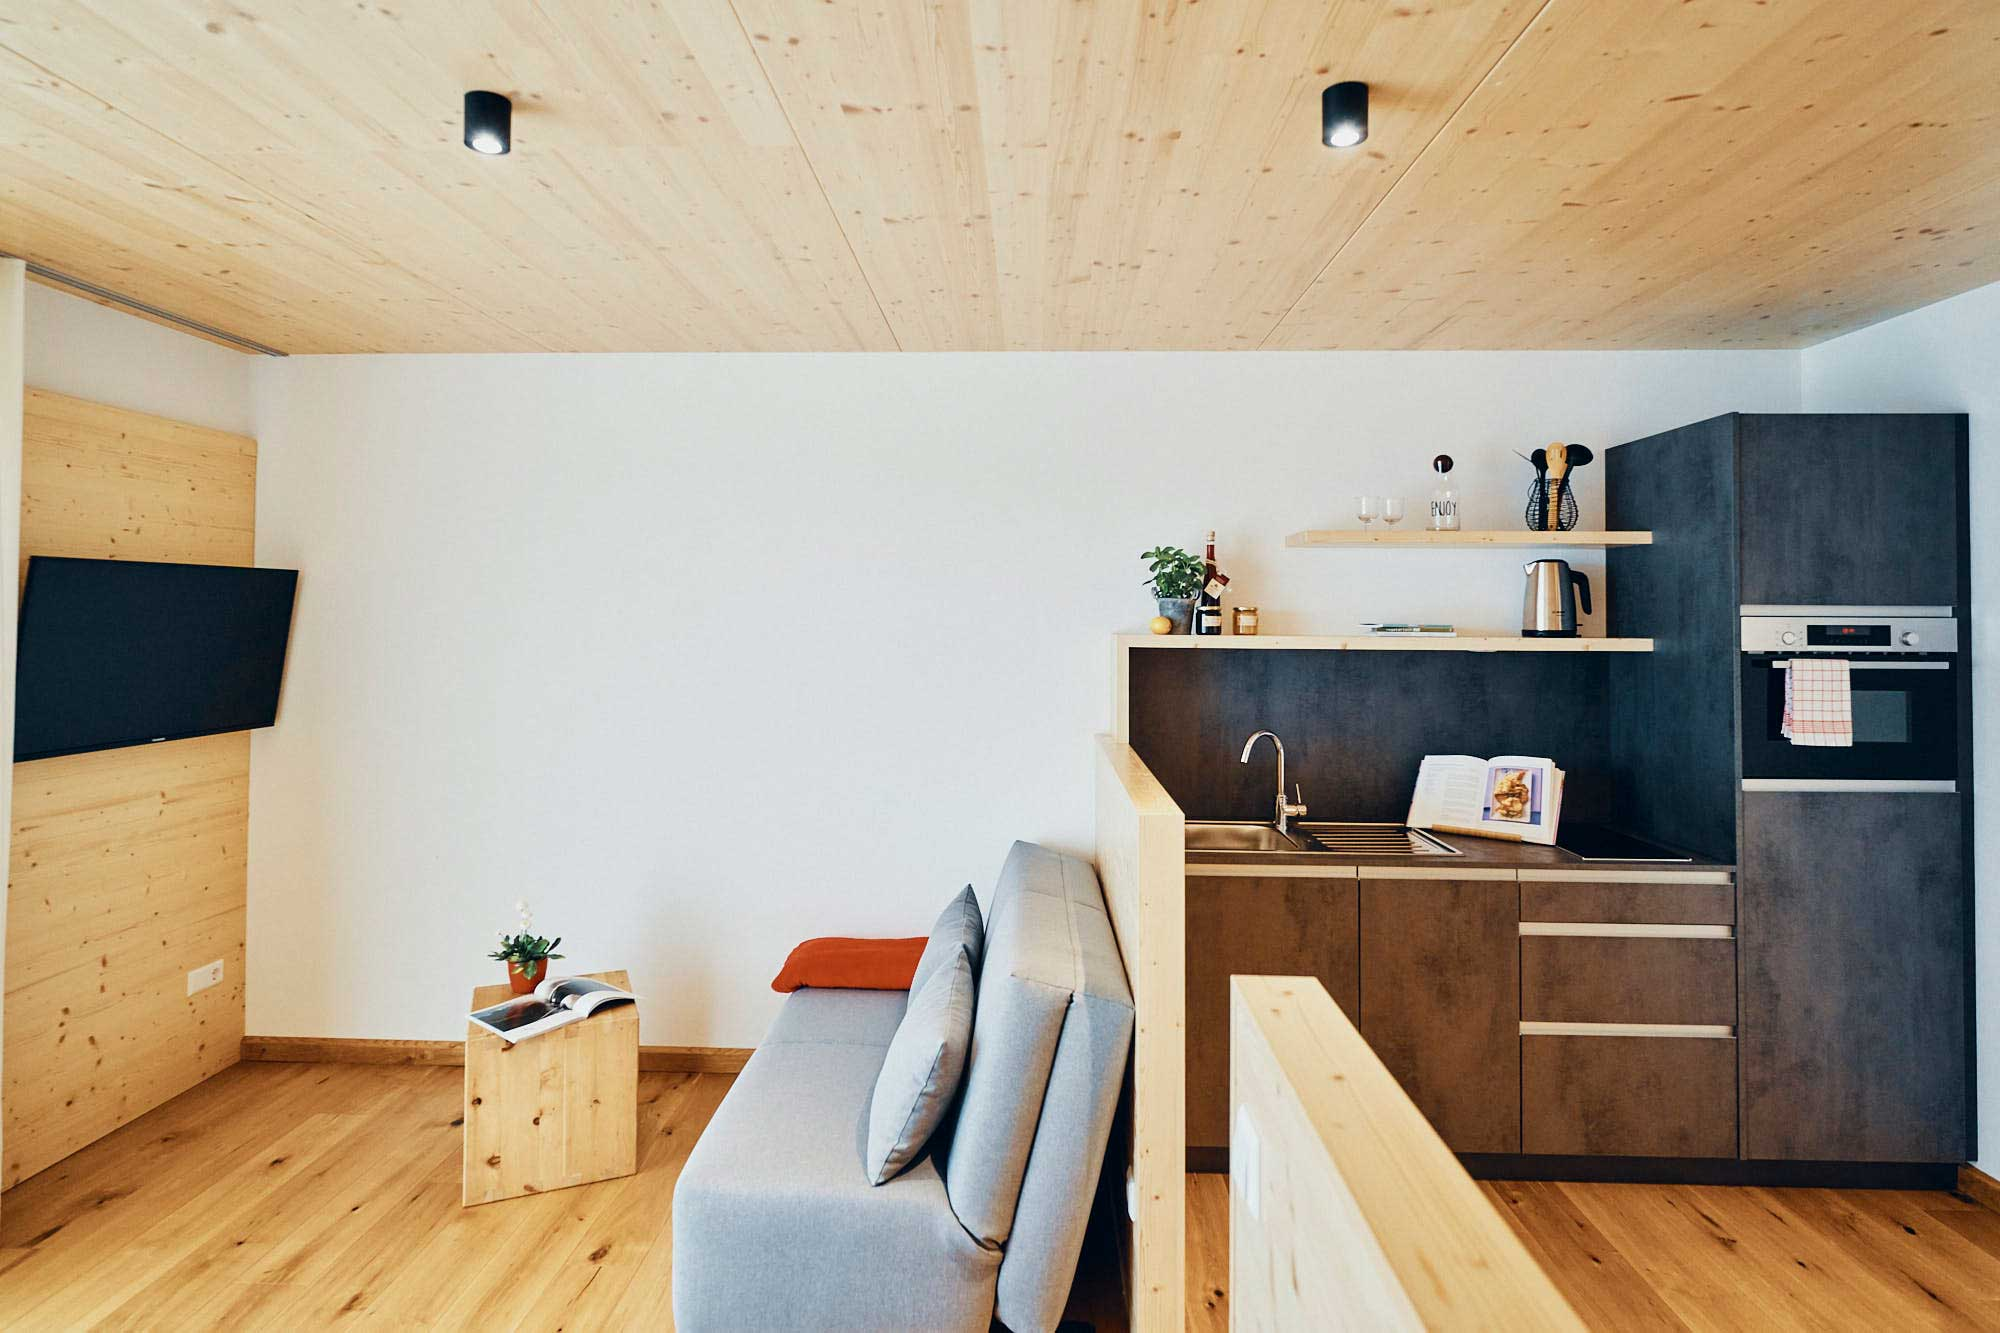 ECHTZEIT Ferien Apartment - Roter Faden - Wohlfühl-Zimmer